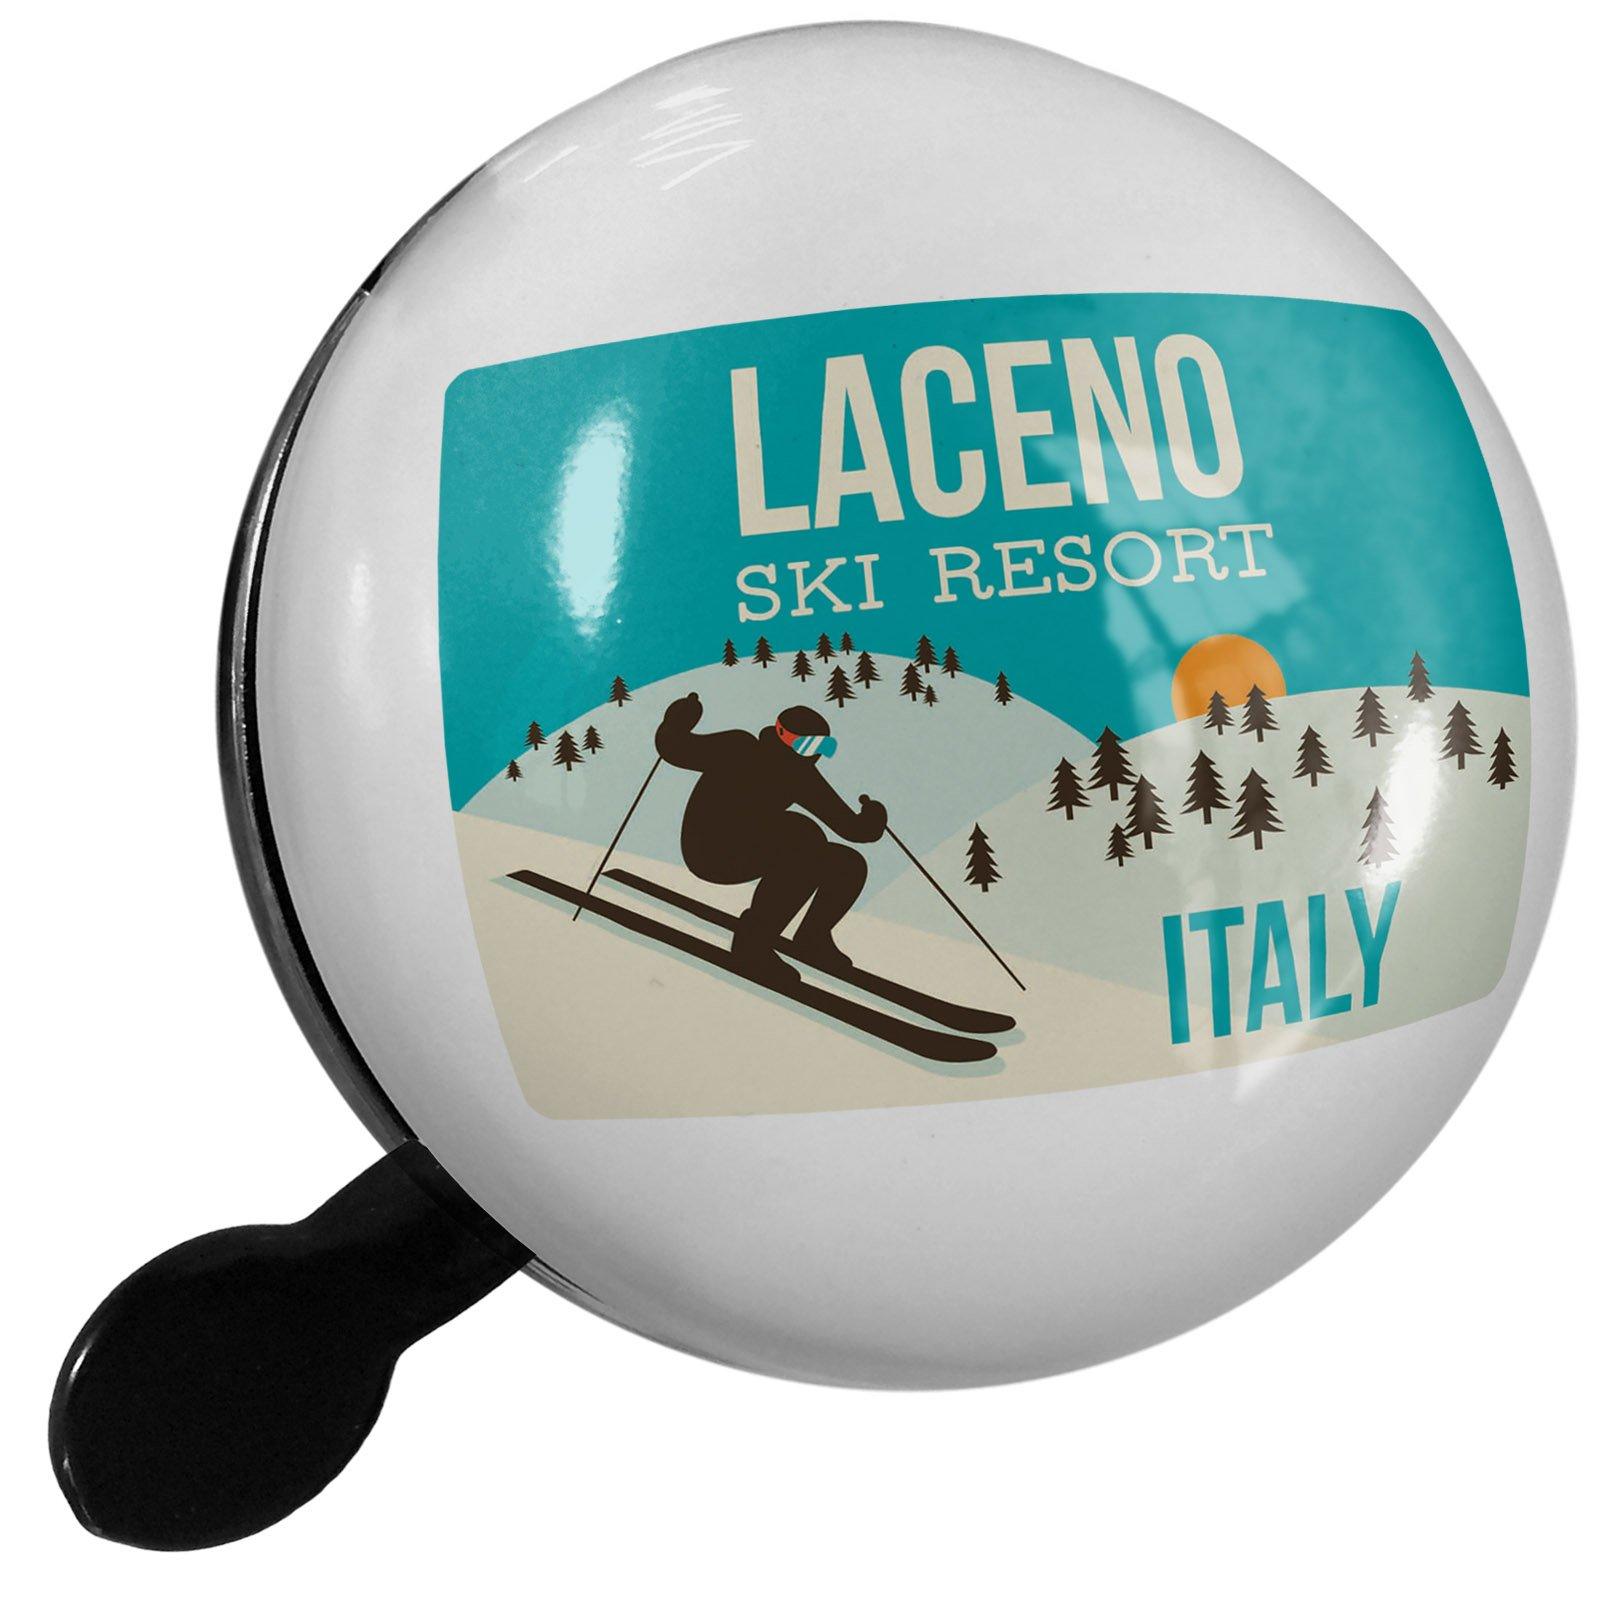 Small Bike Bell Laceno Ski Resort - Italy Ski Resort - NEONBLOND